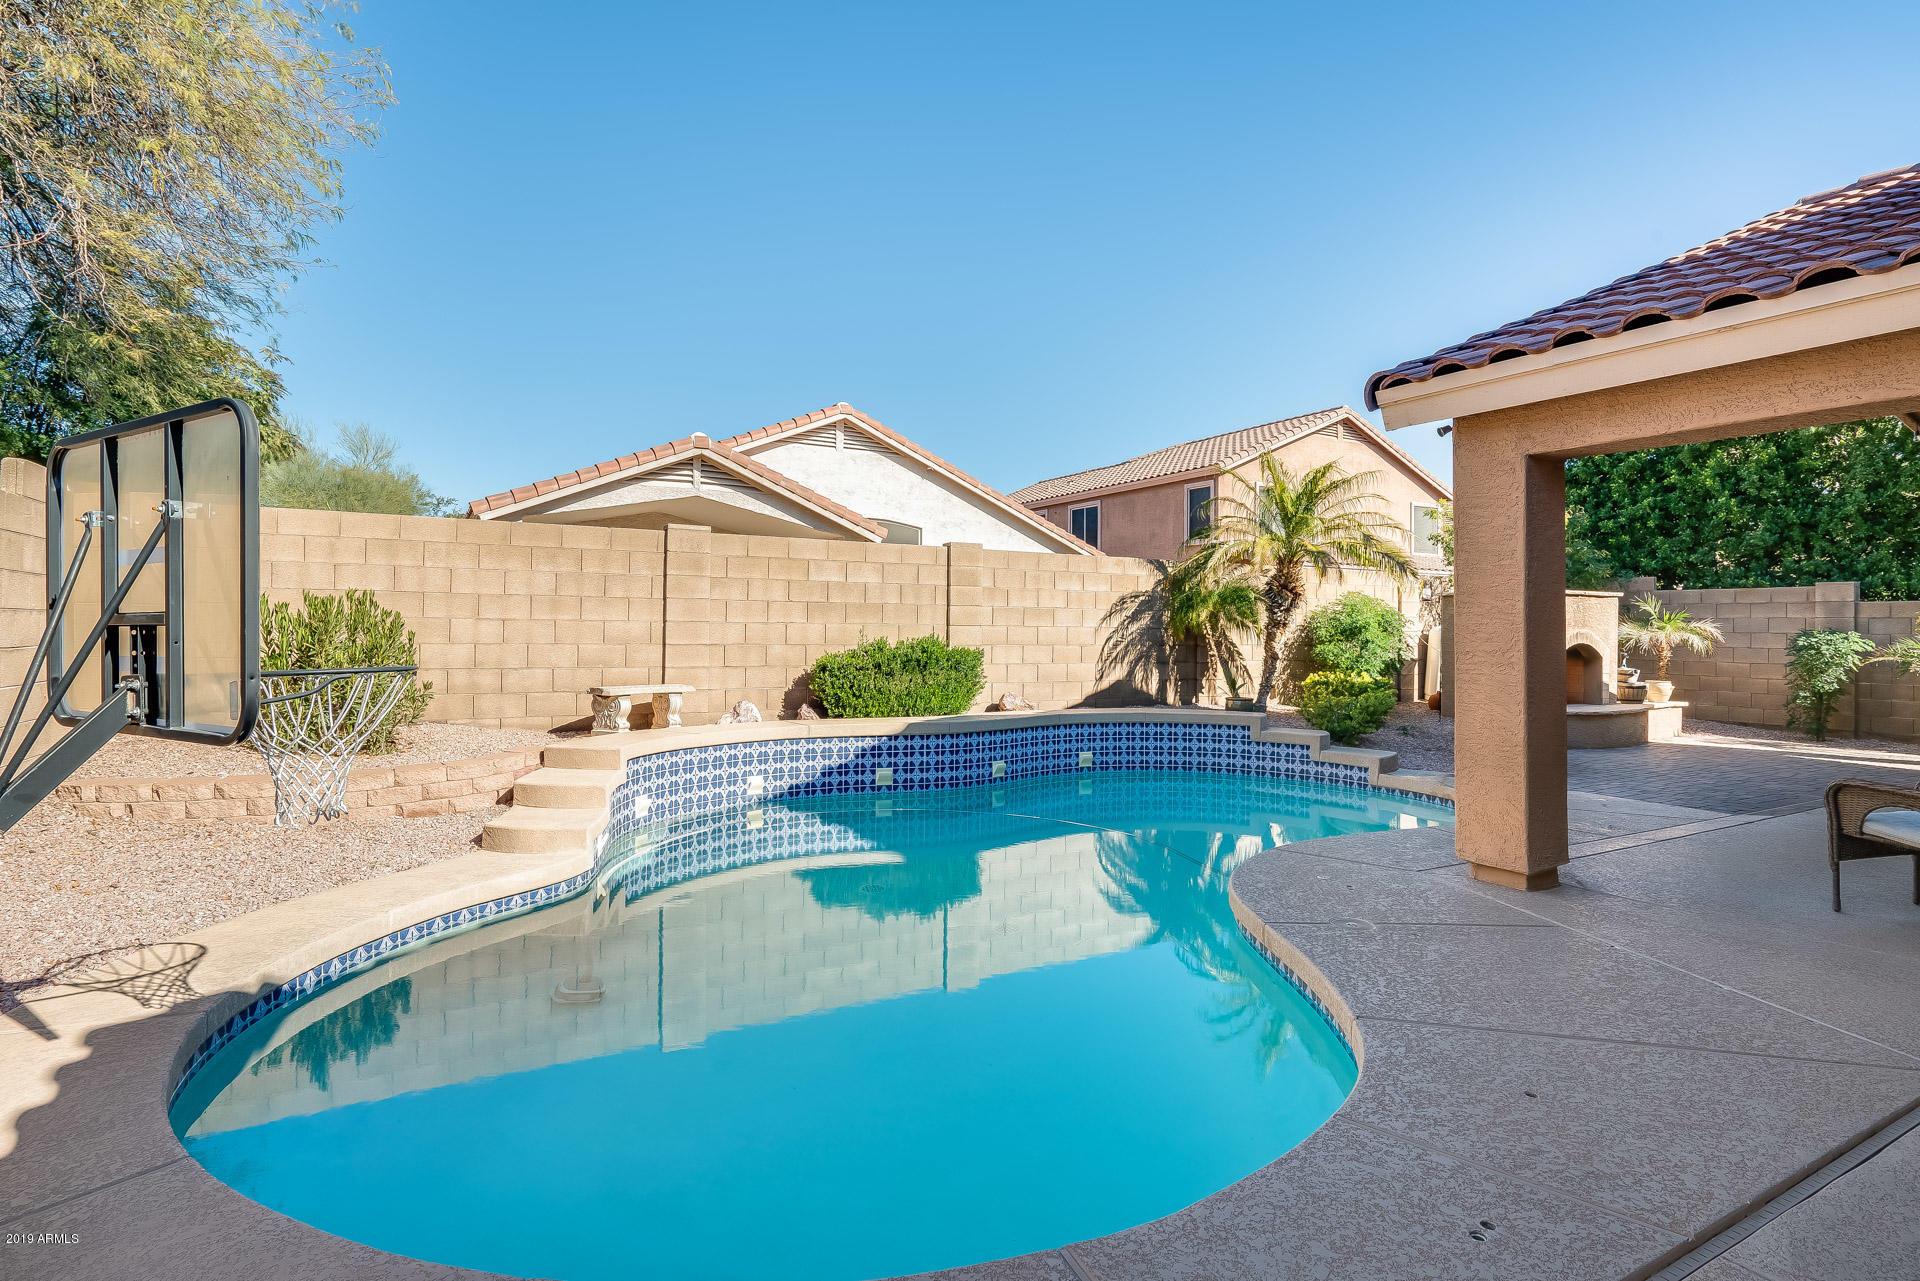 MLS 5874872 7454 W MOHAWK Lane, Glendale, AZ 85308 Glendale AZ Sierra Verde